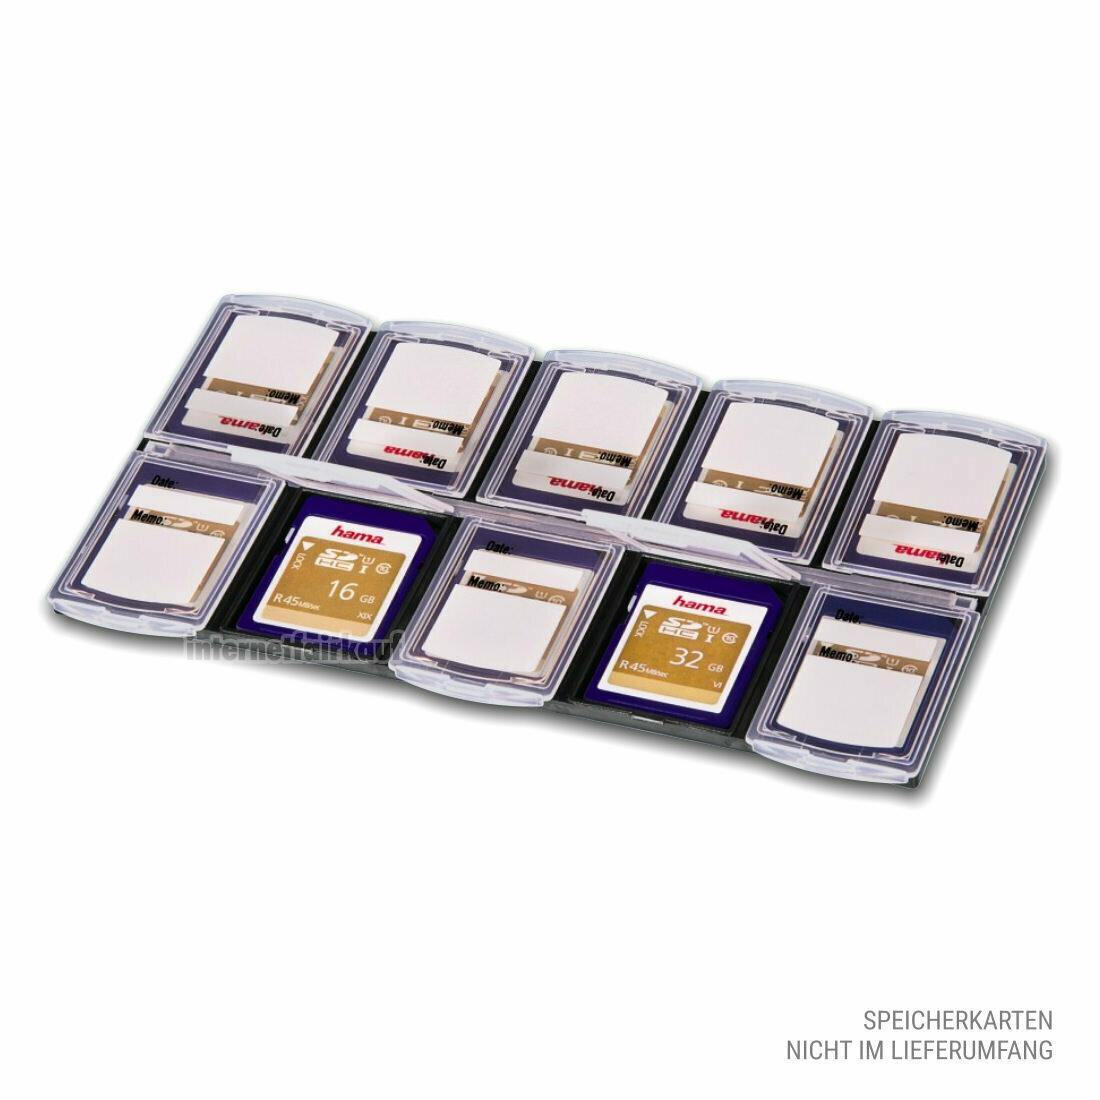 Hama Speicherkarten-Box Organizer, Schwarz/Transparent